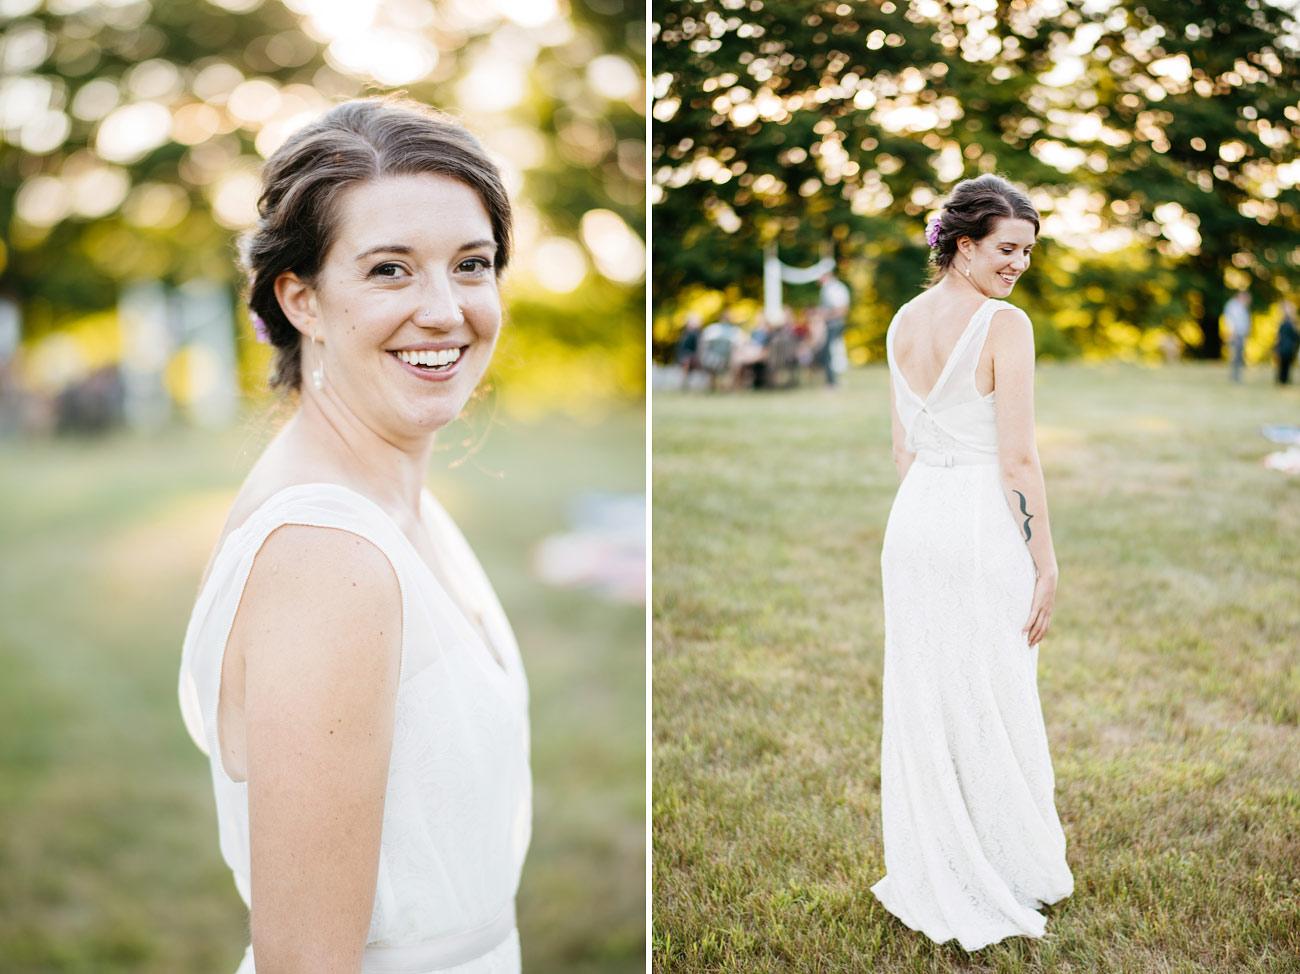 beautiful bride at a backyard wedding west mountain inn weddings  HABITAT EDUCATION CENTER & WILDLIFE SANCTUARY WEDDING  riverside farm vermont wedding